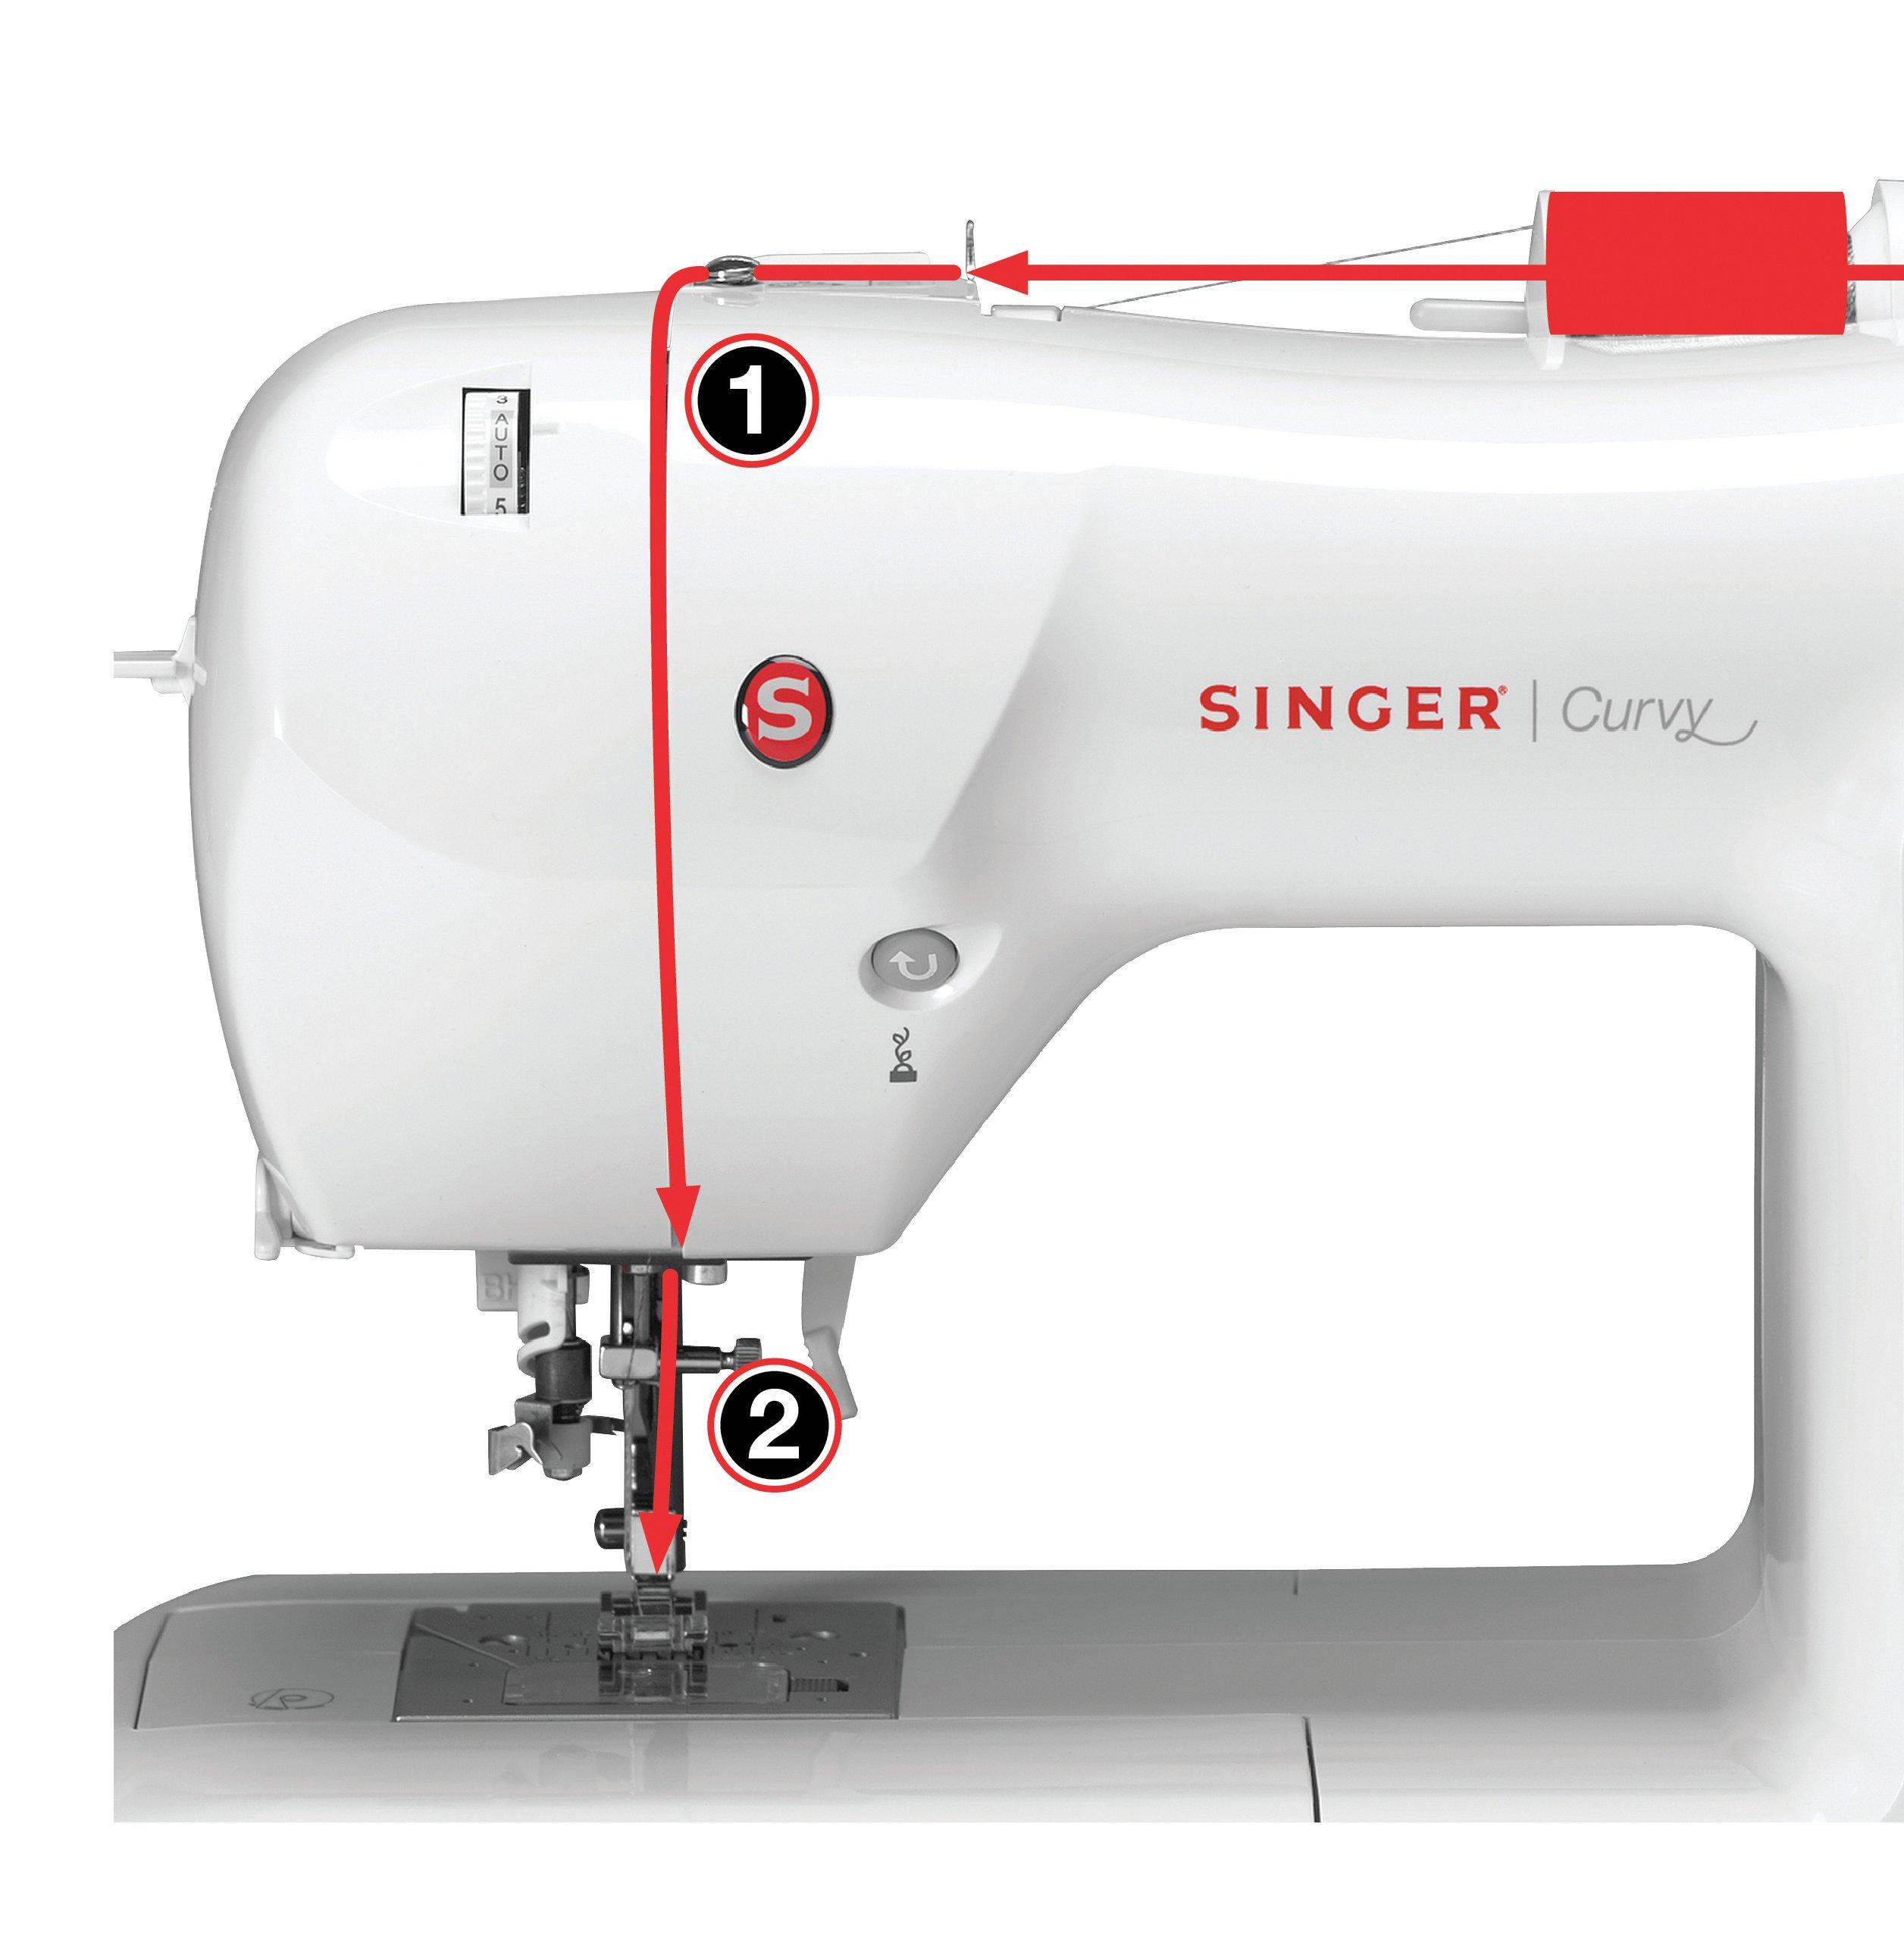 SINGER Curvy - Máquina de coser (Rosa, Blanco, Máquina de coser ...